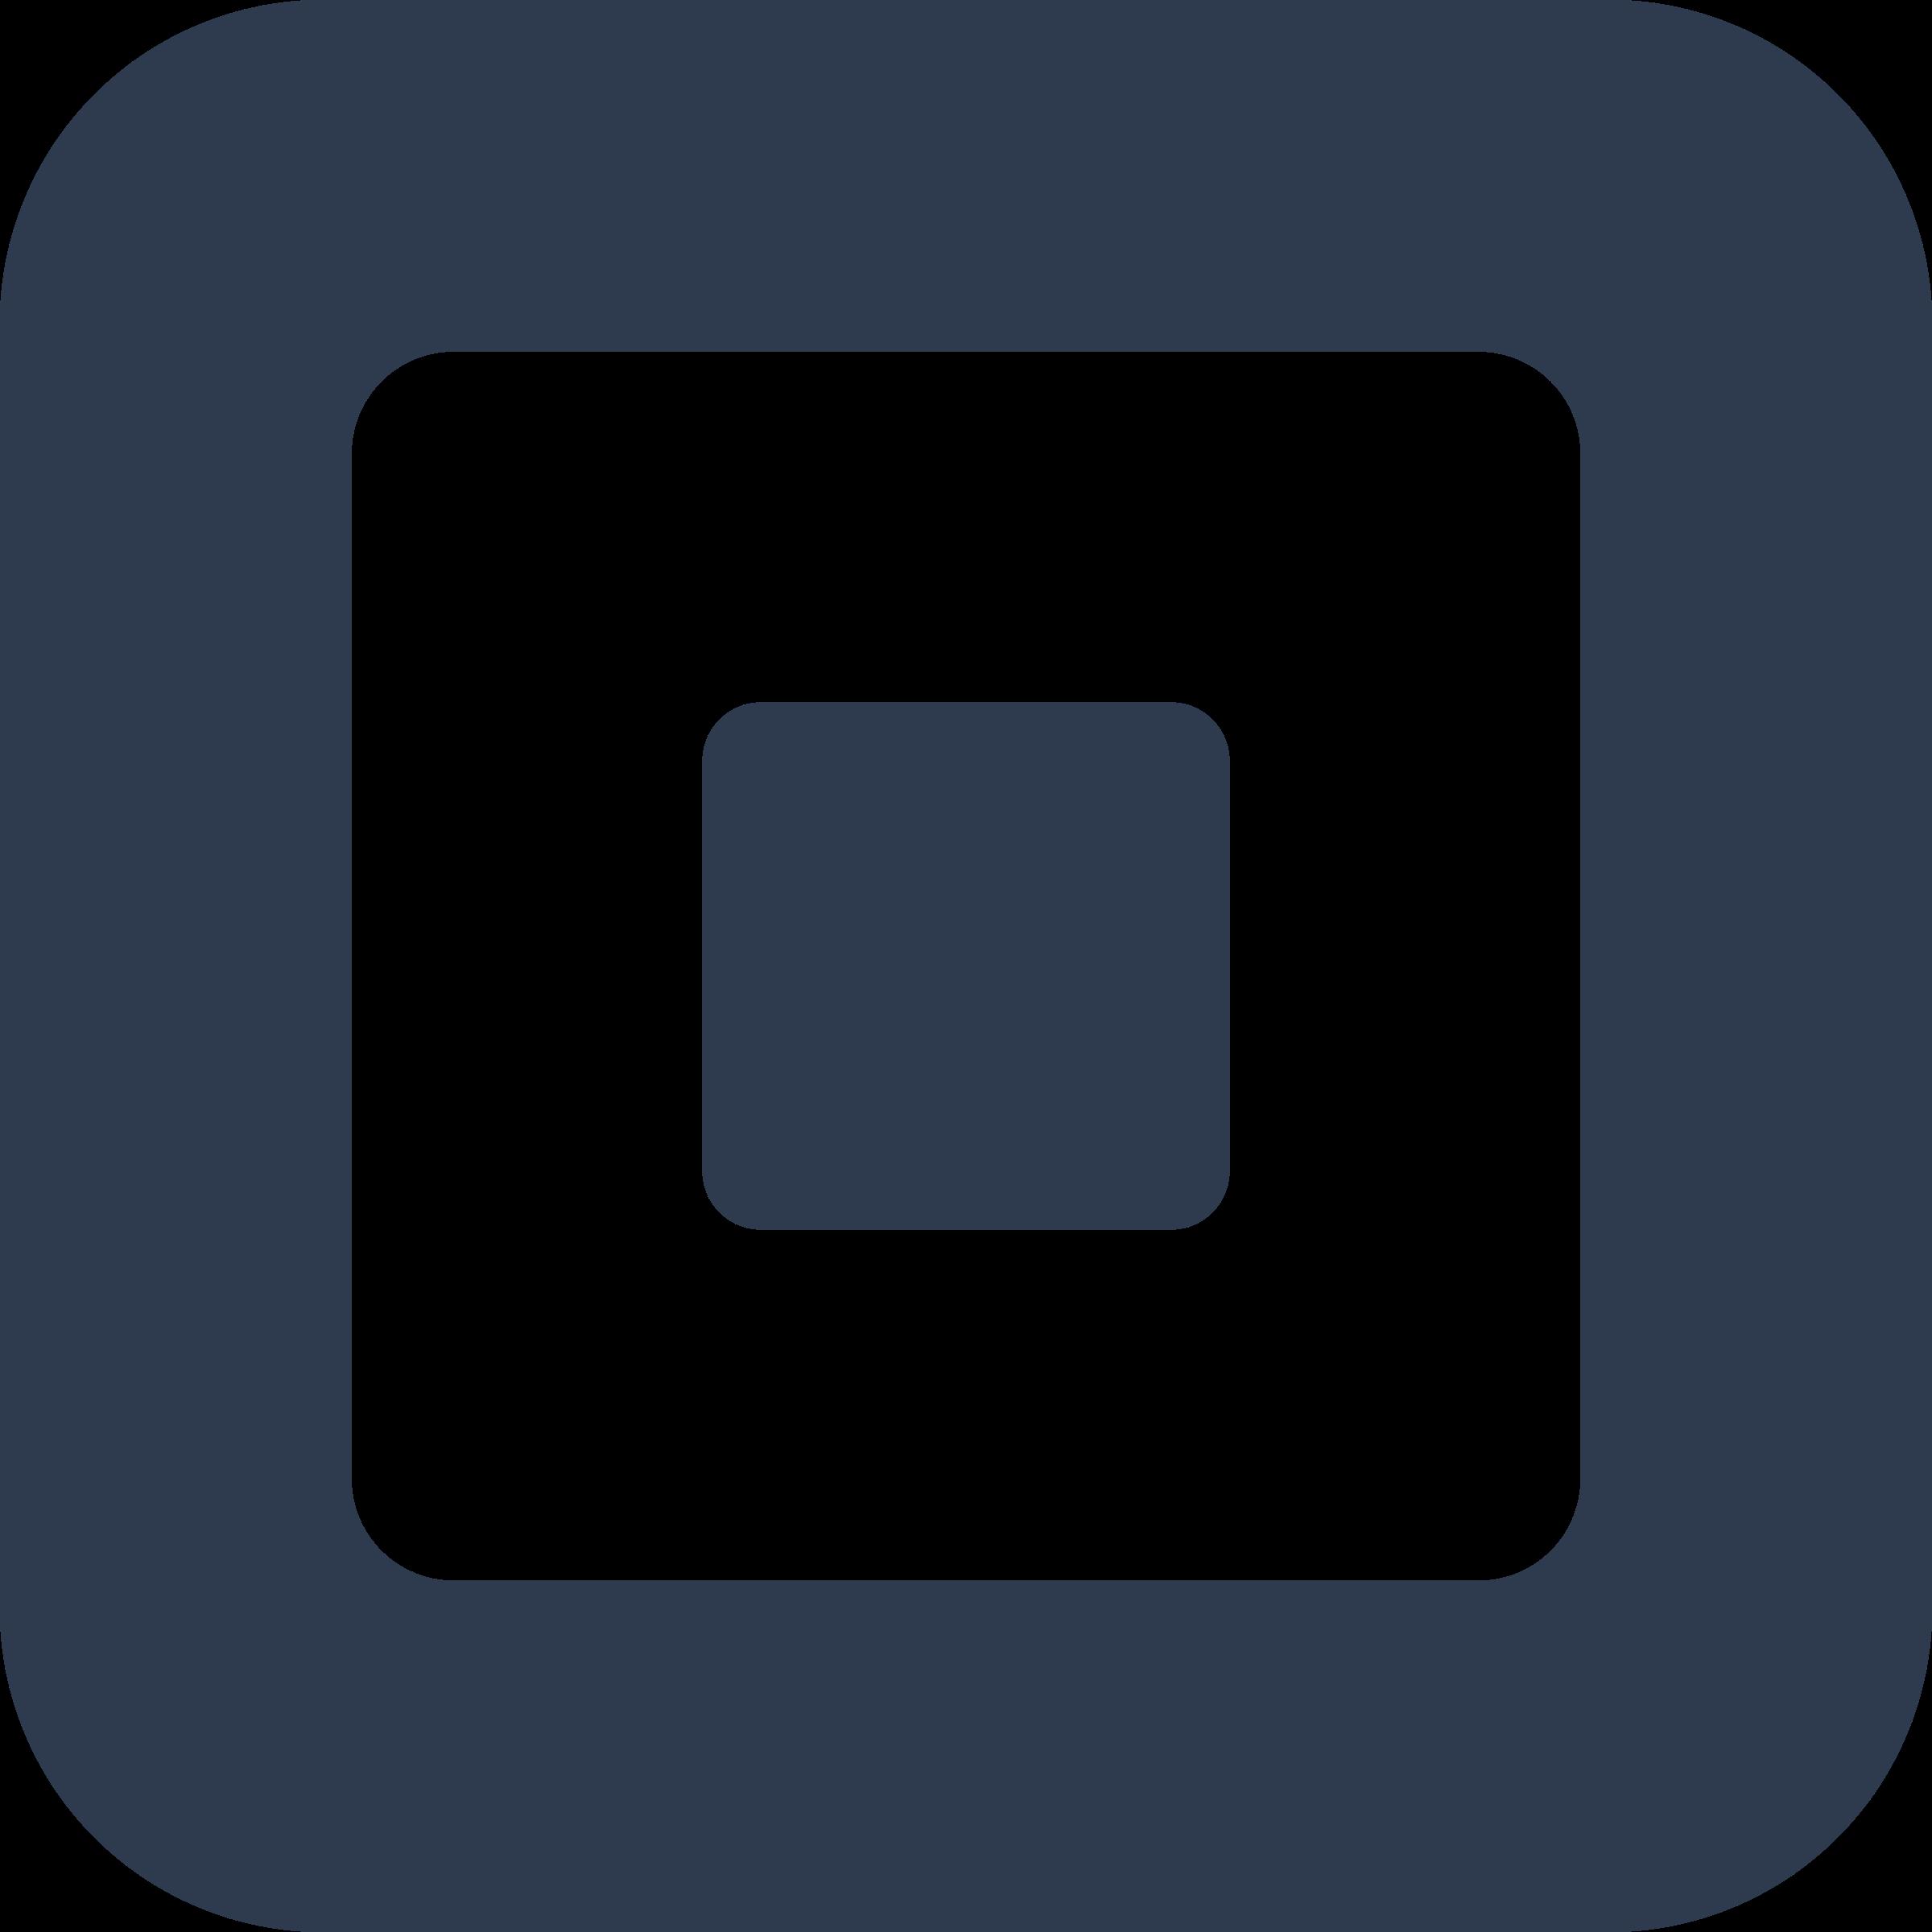 Logo png transparent svg. Square clipart sqaure